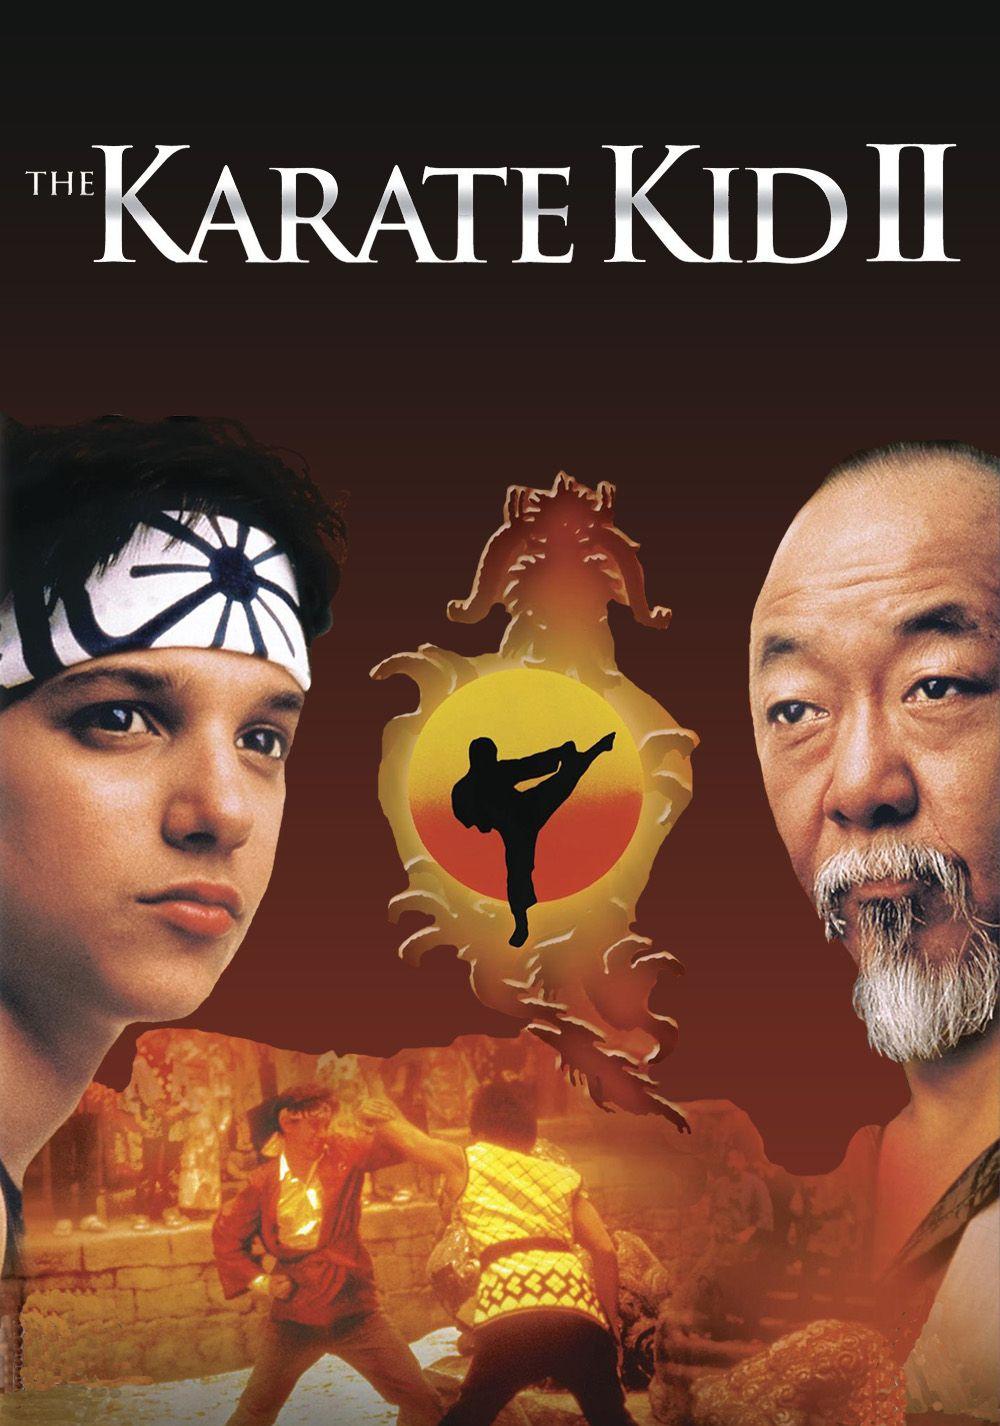 Cobra Kai Streaming Vf : cobra, streaming, Karate, (1986), Lesson, Share, Price, Honor, Glory, Friendship, Karate,, Movies, Online